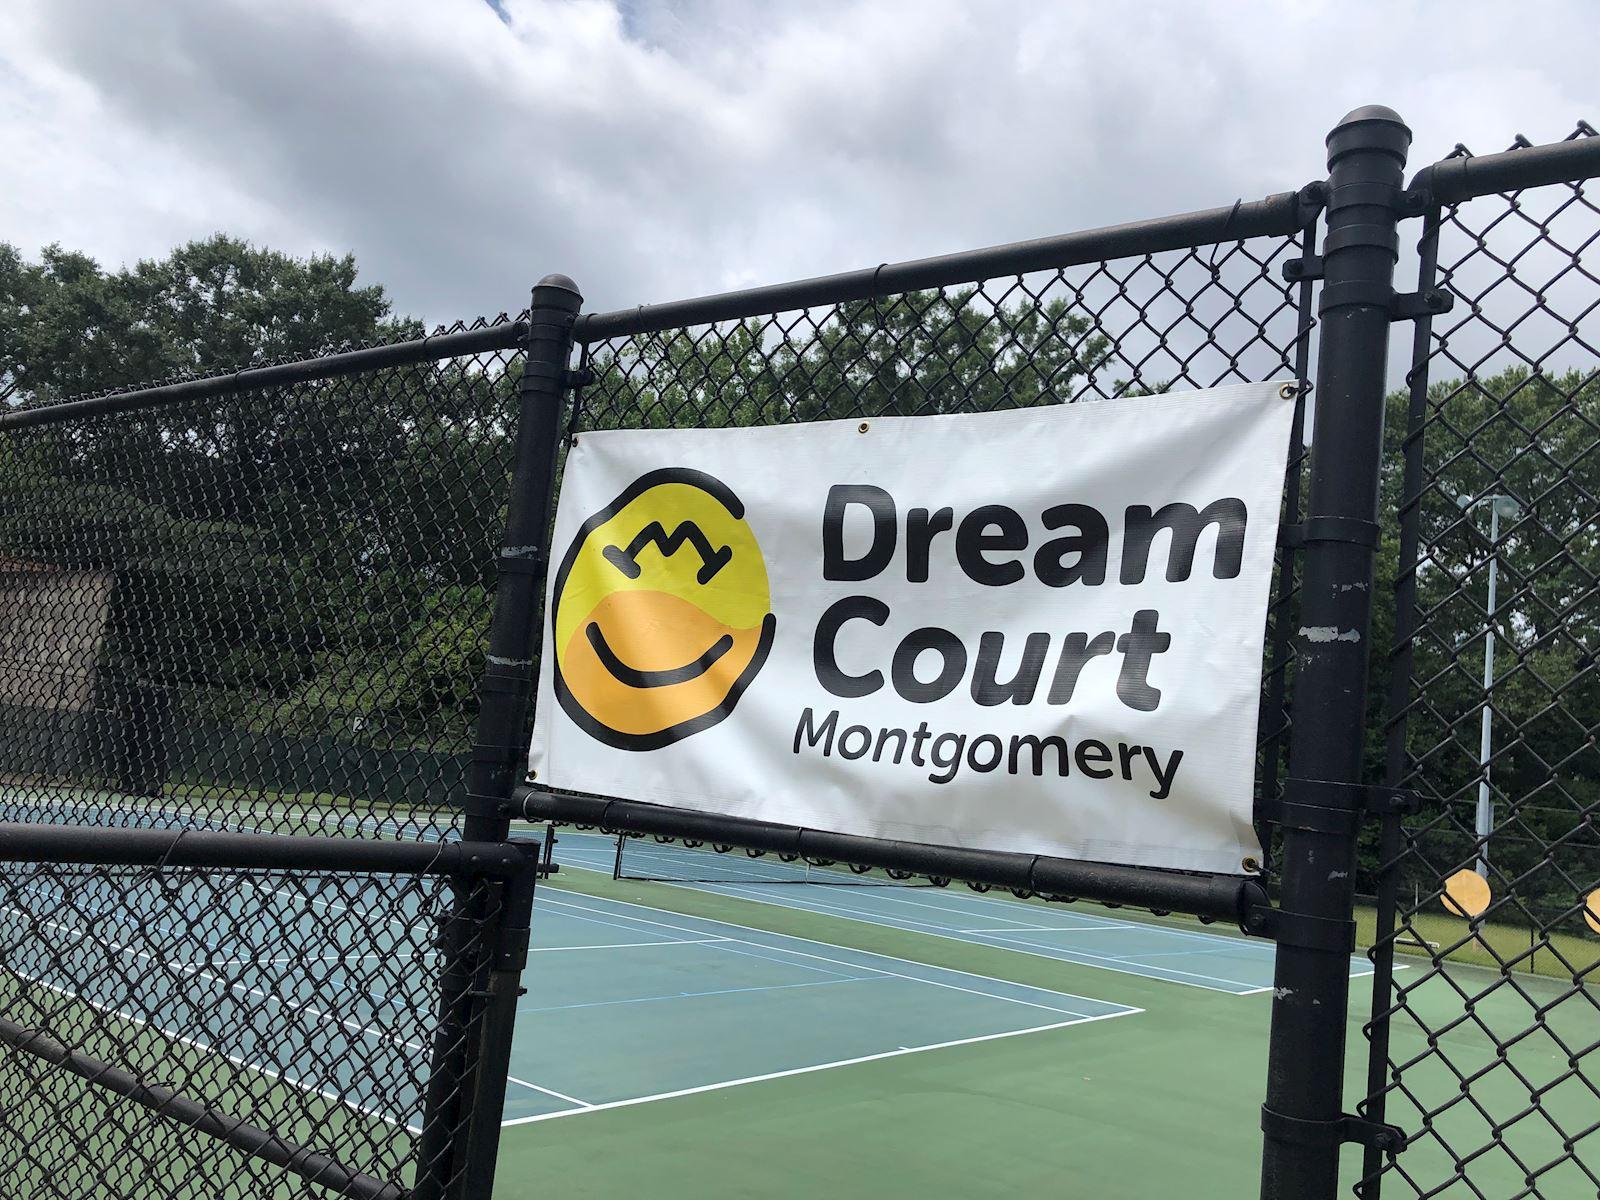 Dream Court